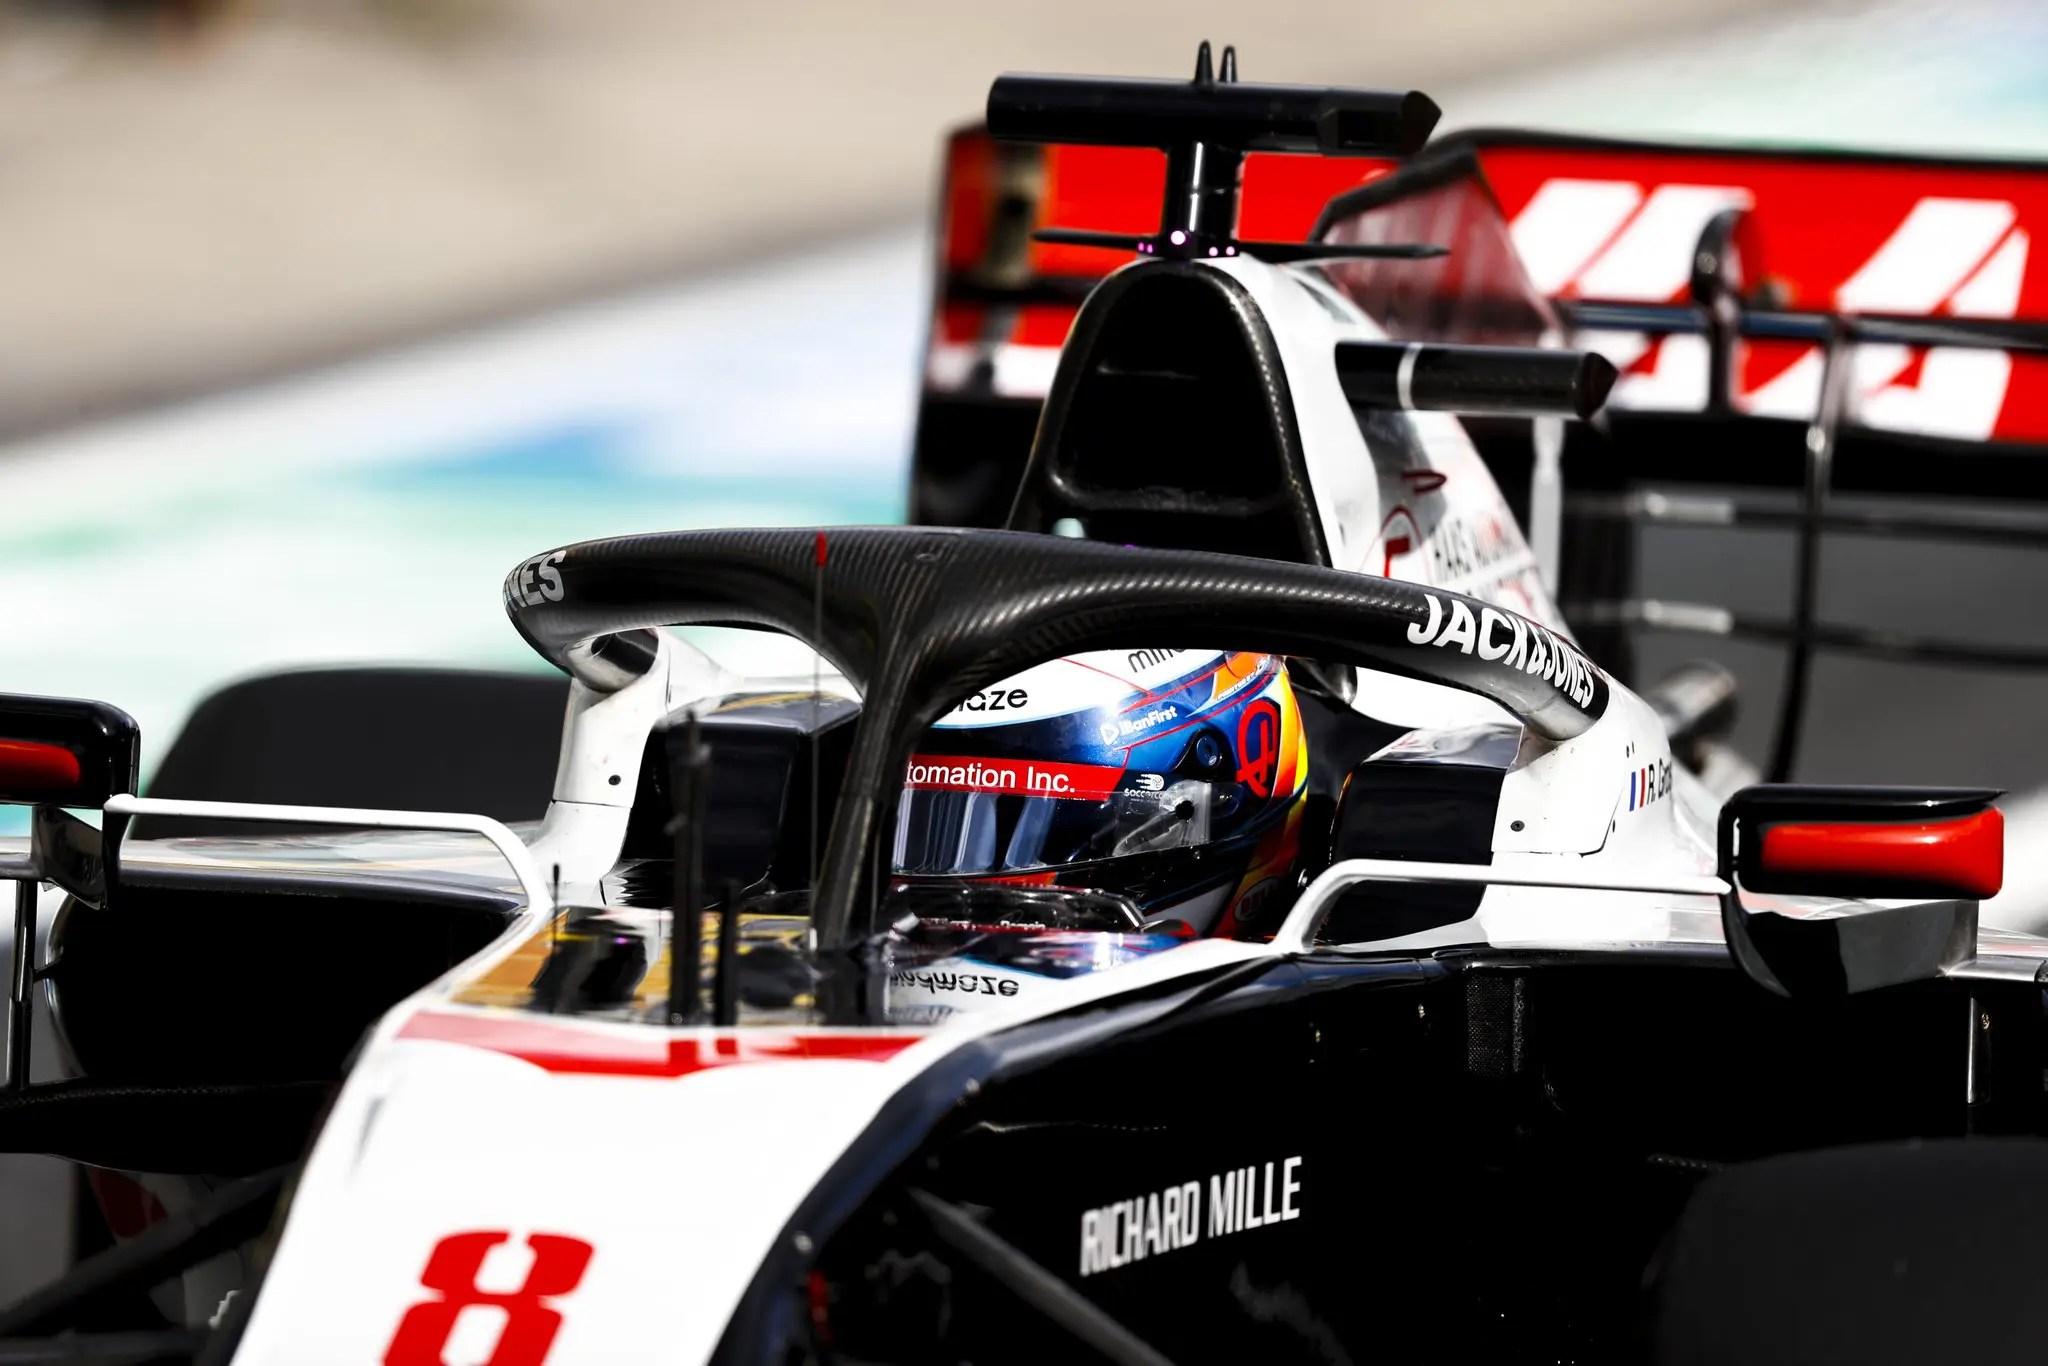 Fin de l'aventure pour Grosjean et Magnussen — Haas